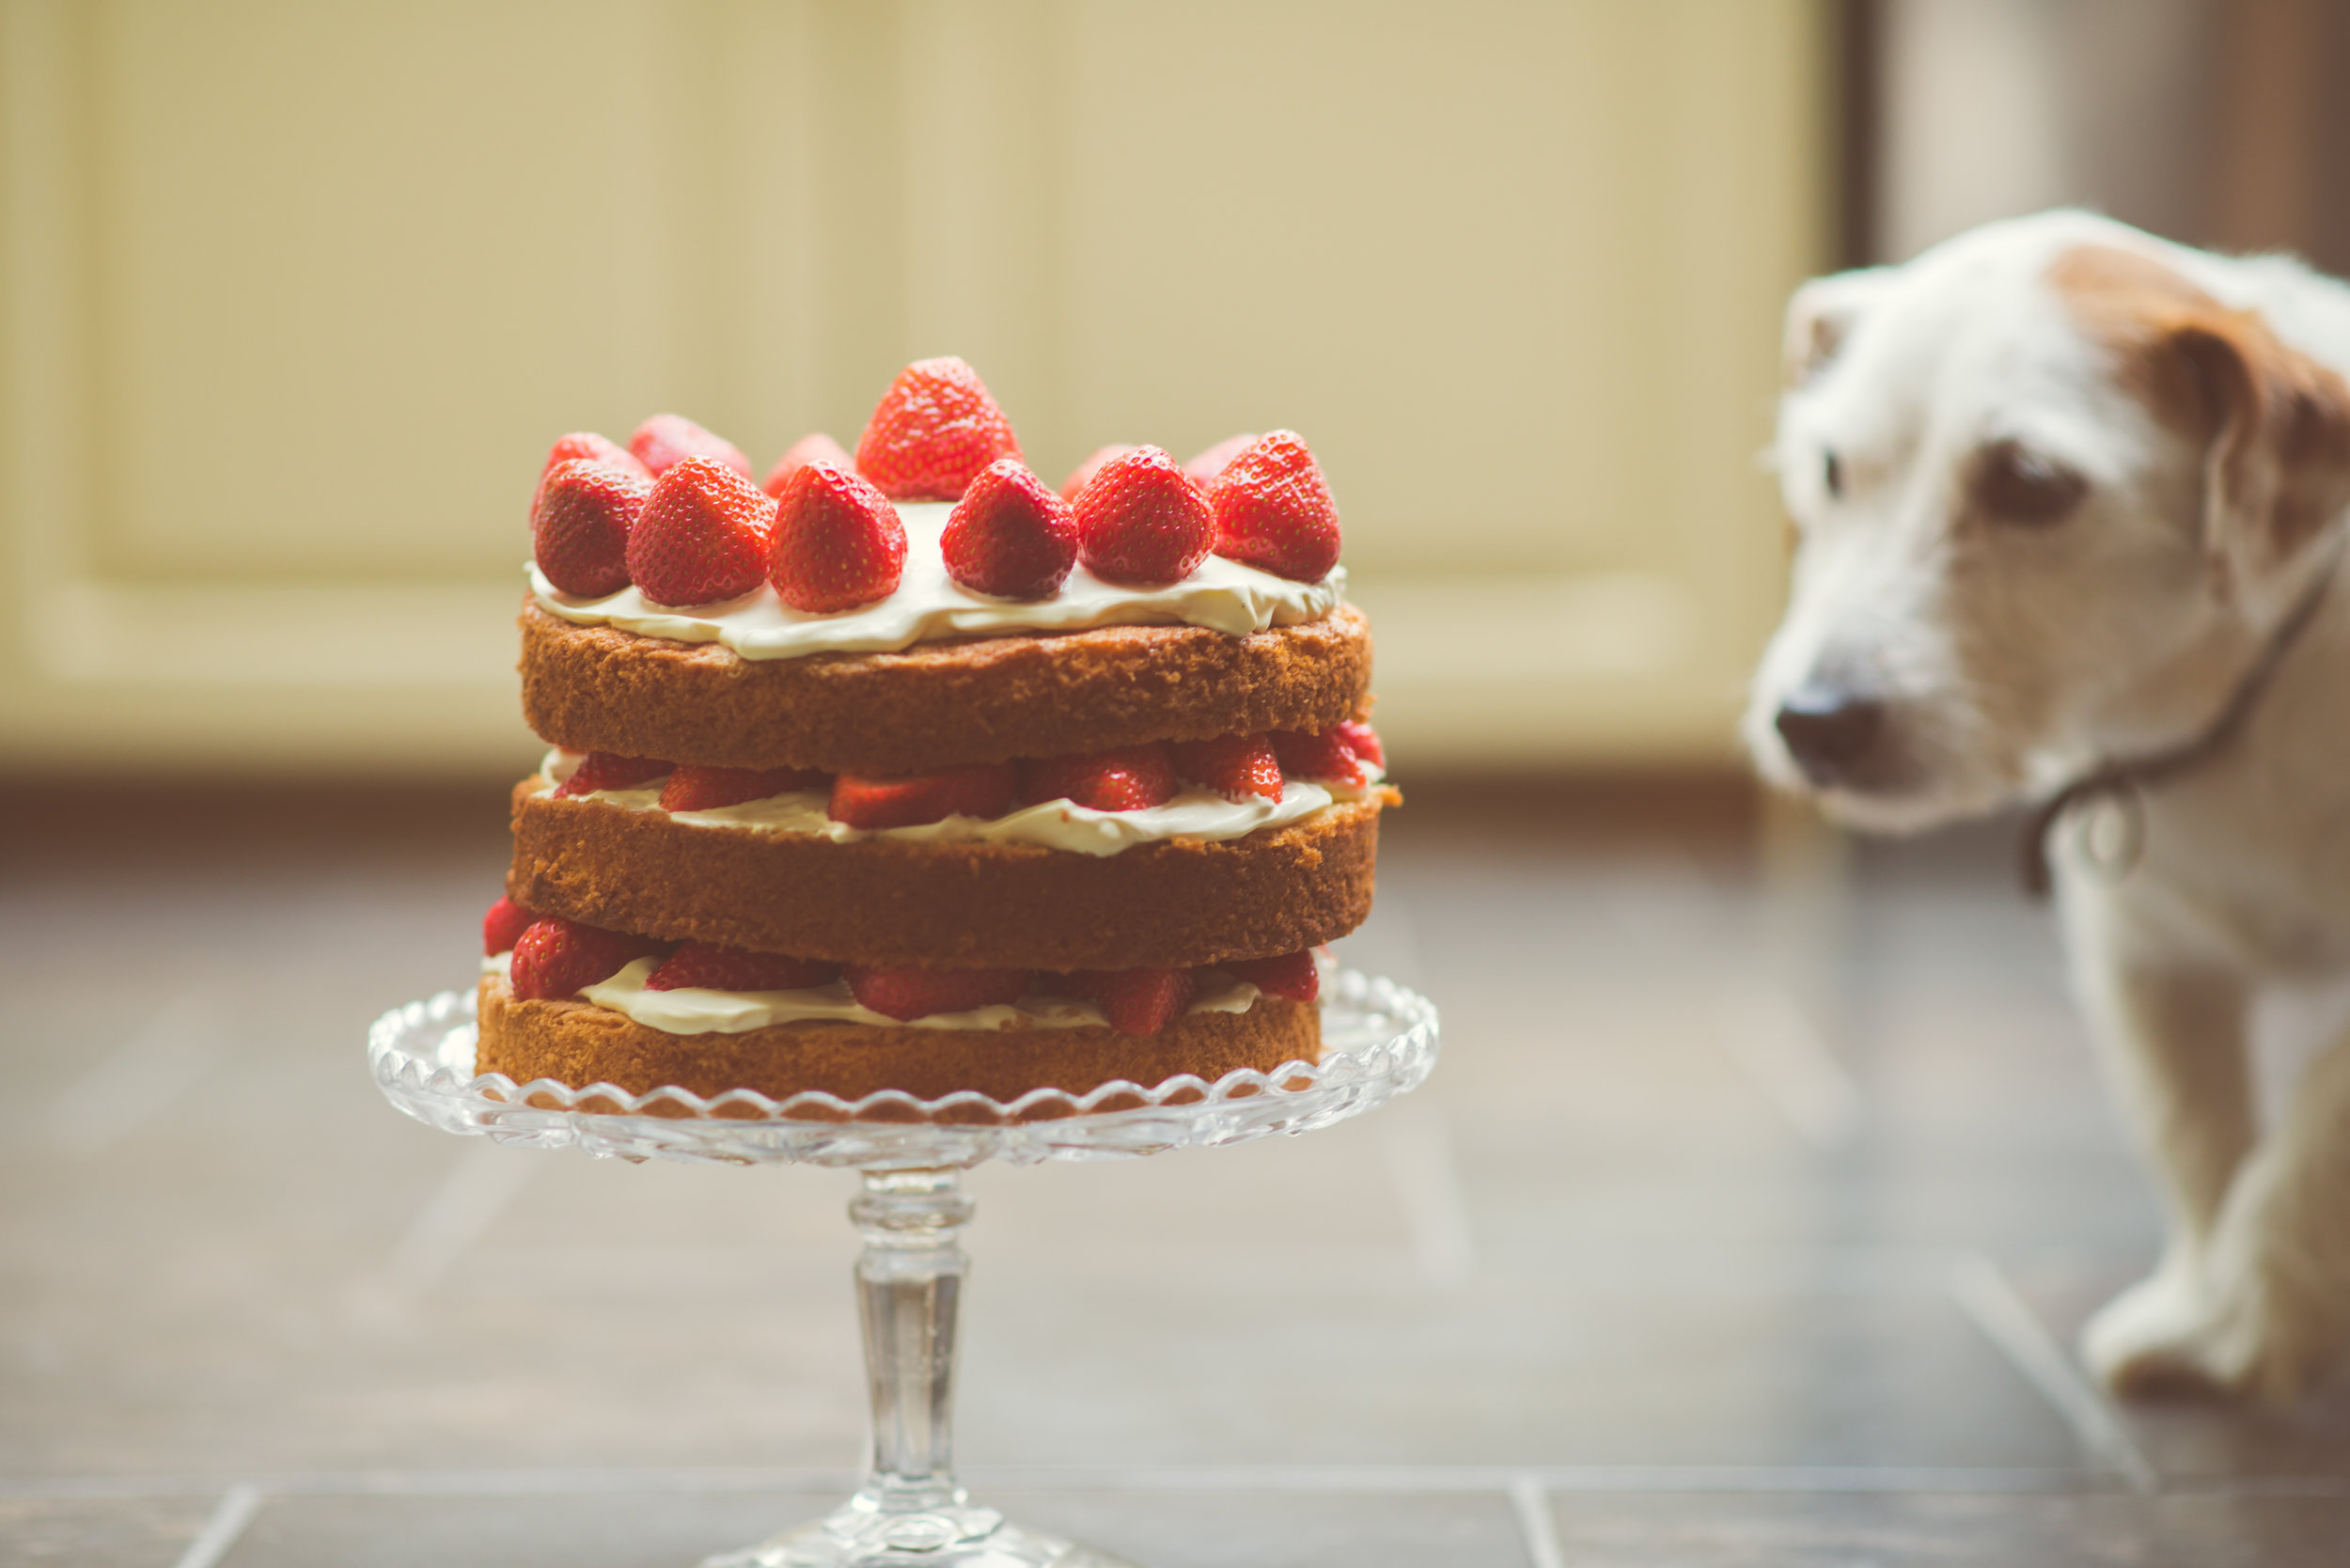 Fresh-Strawberry-Cream-Cake-With-Interested-Dog.jpg